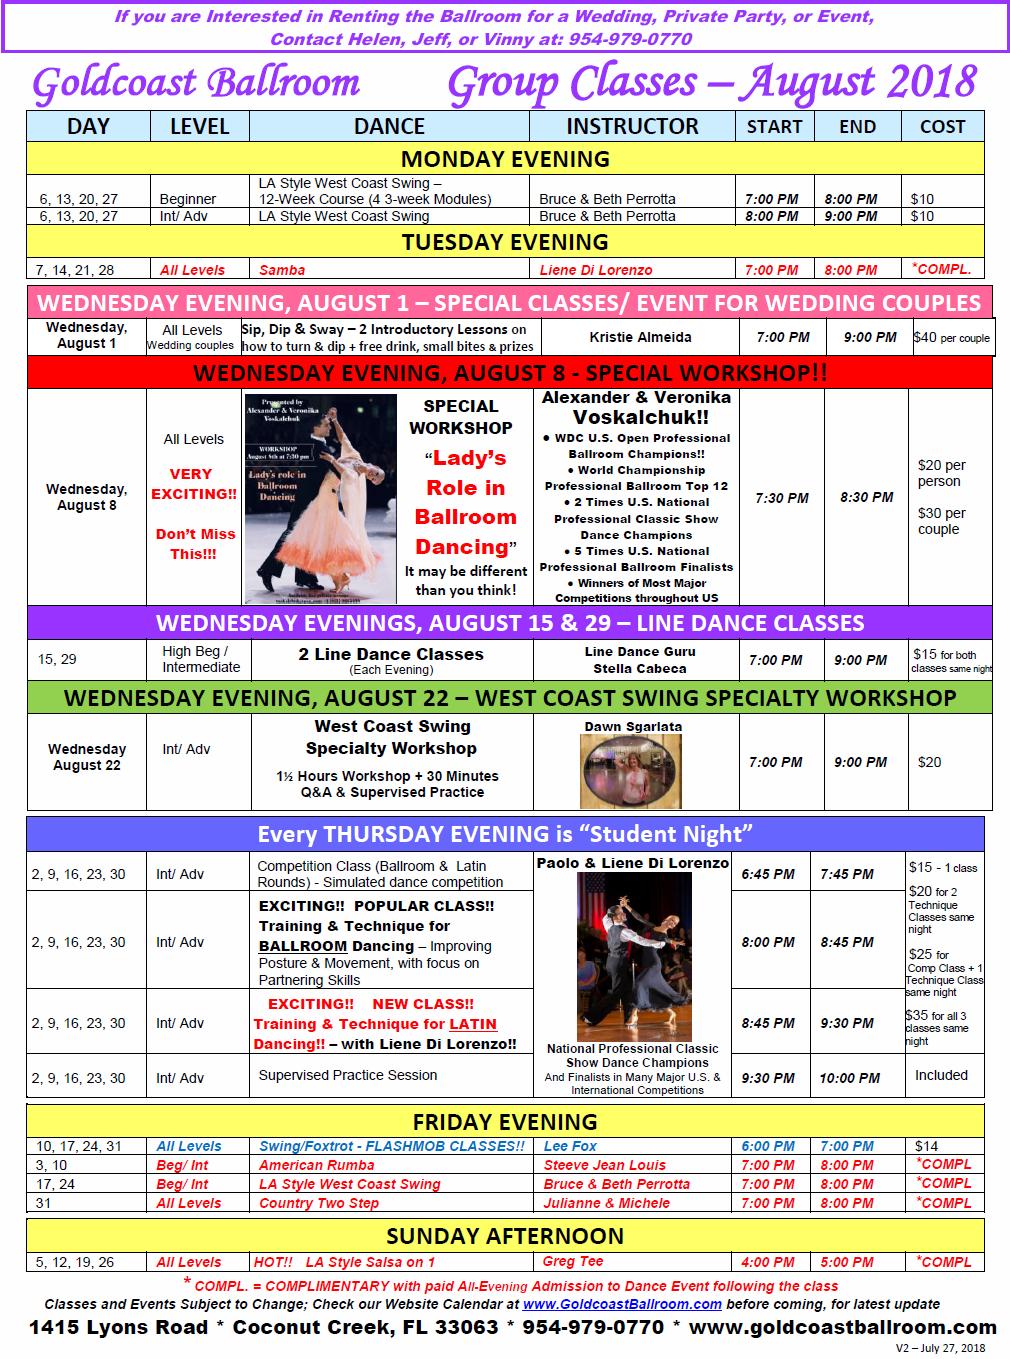 Goldcoast Ballroom August 2018 Calendar - Group Classes